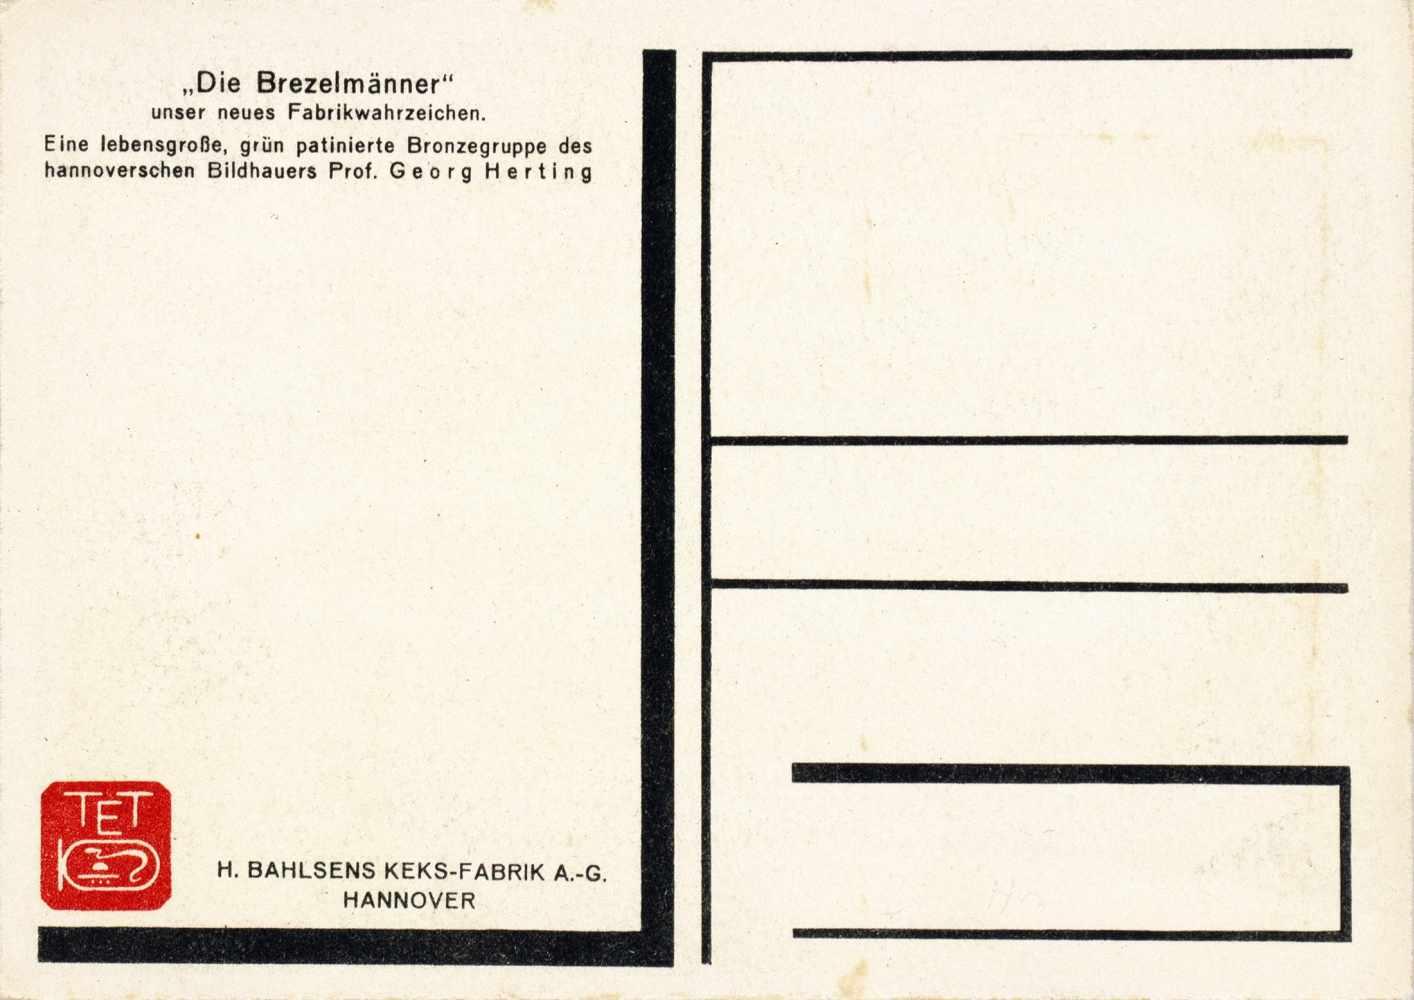 Kurt Schwitters - H. Bahlsens Keks-Farbik Hannover. Drei Werbepostkarten. Um 1929. 10,5 : 14,8 cm.